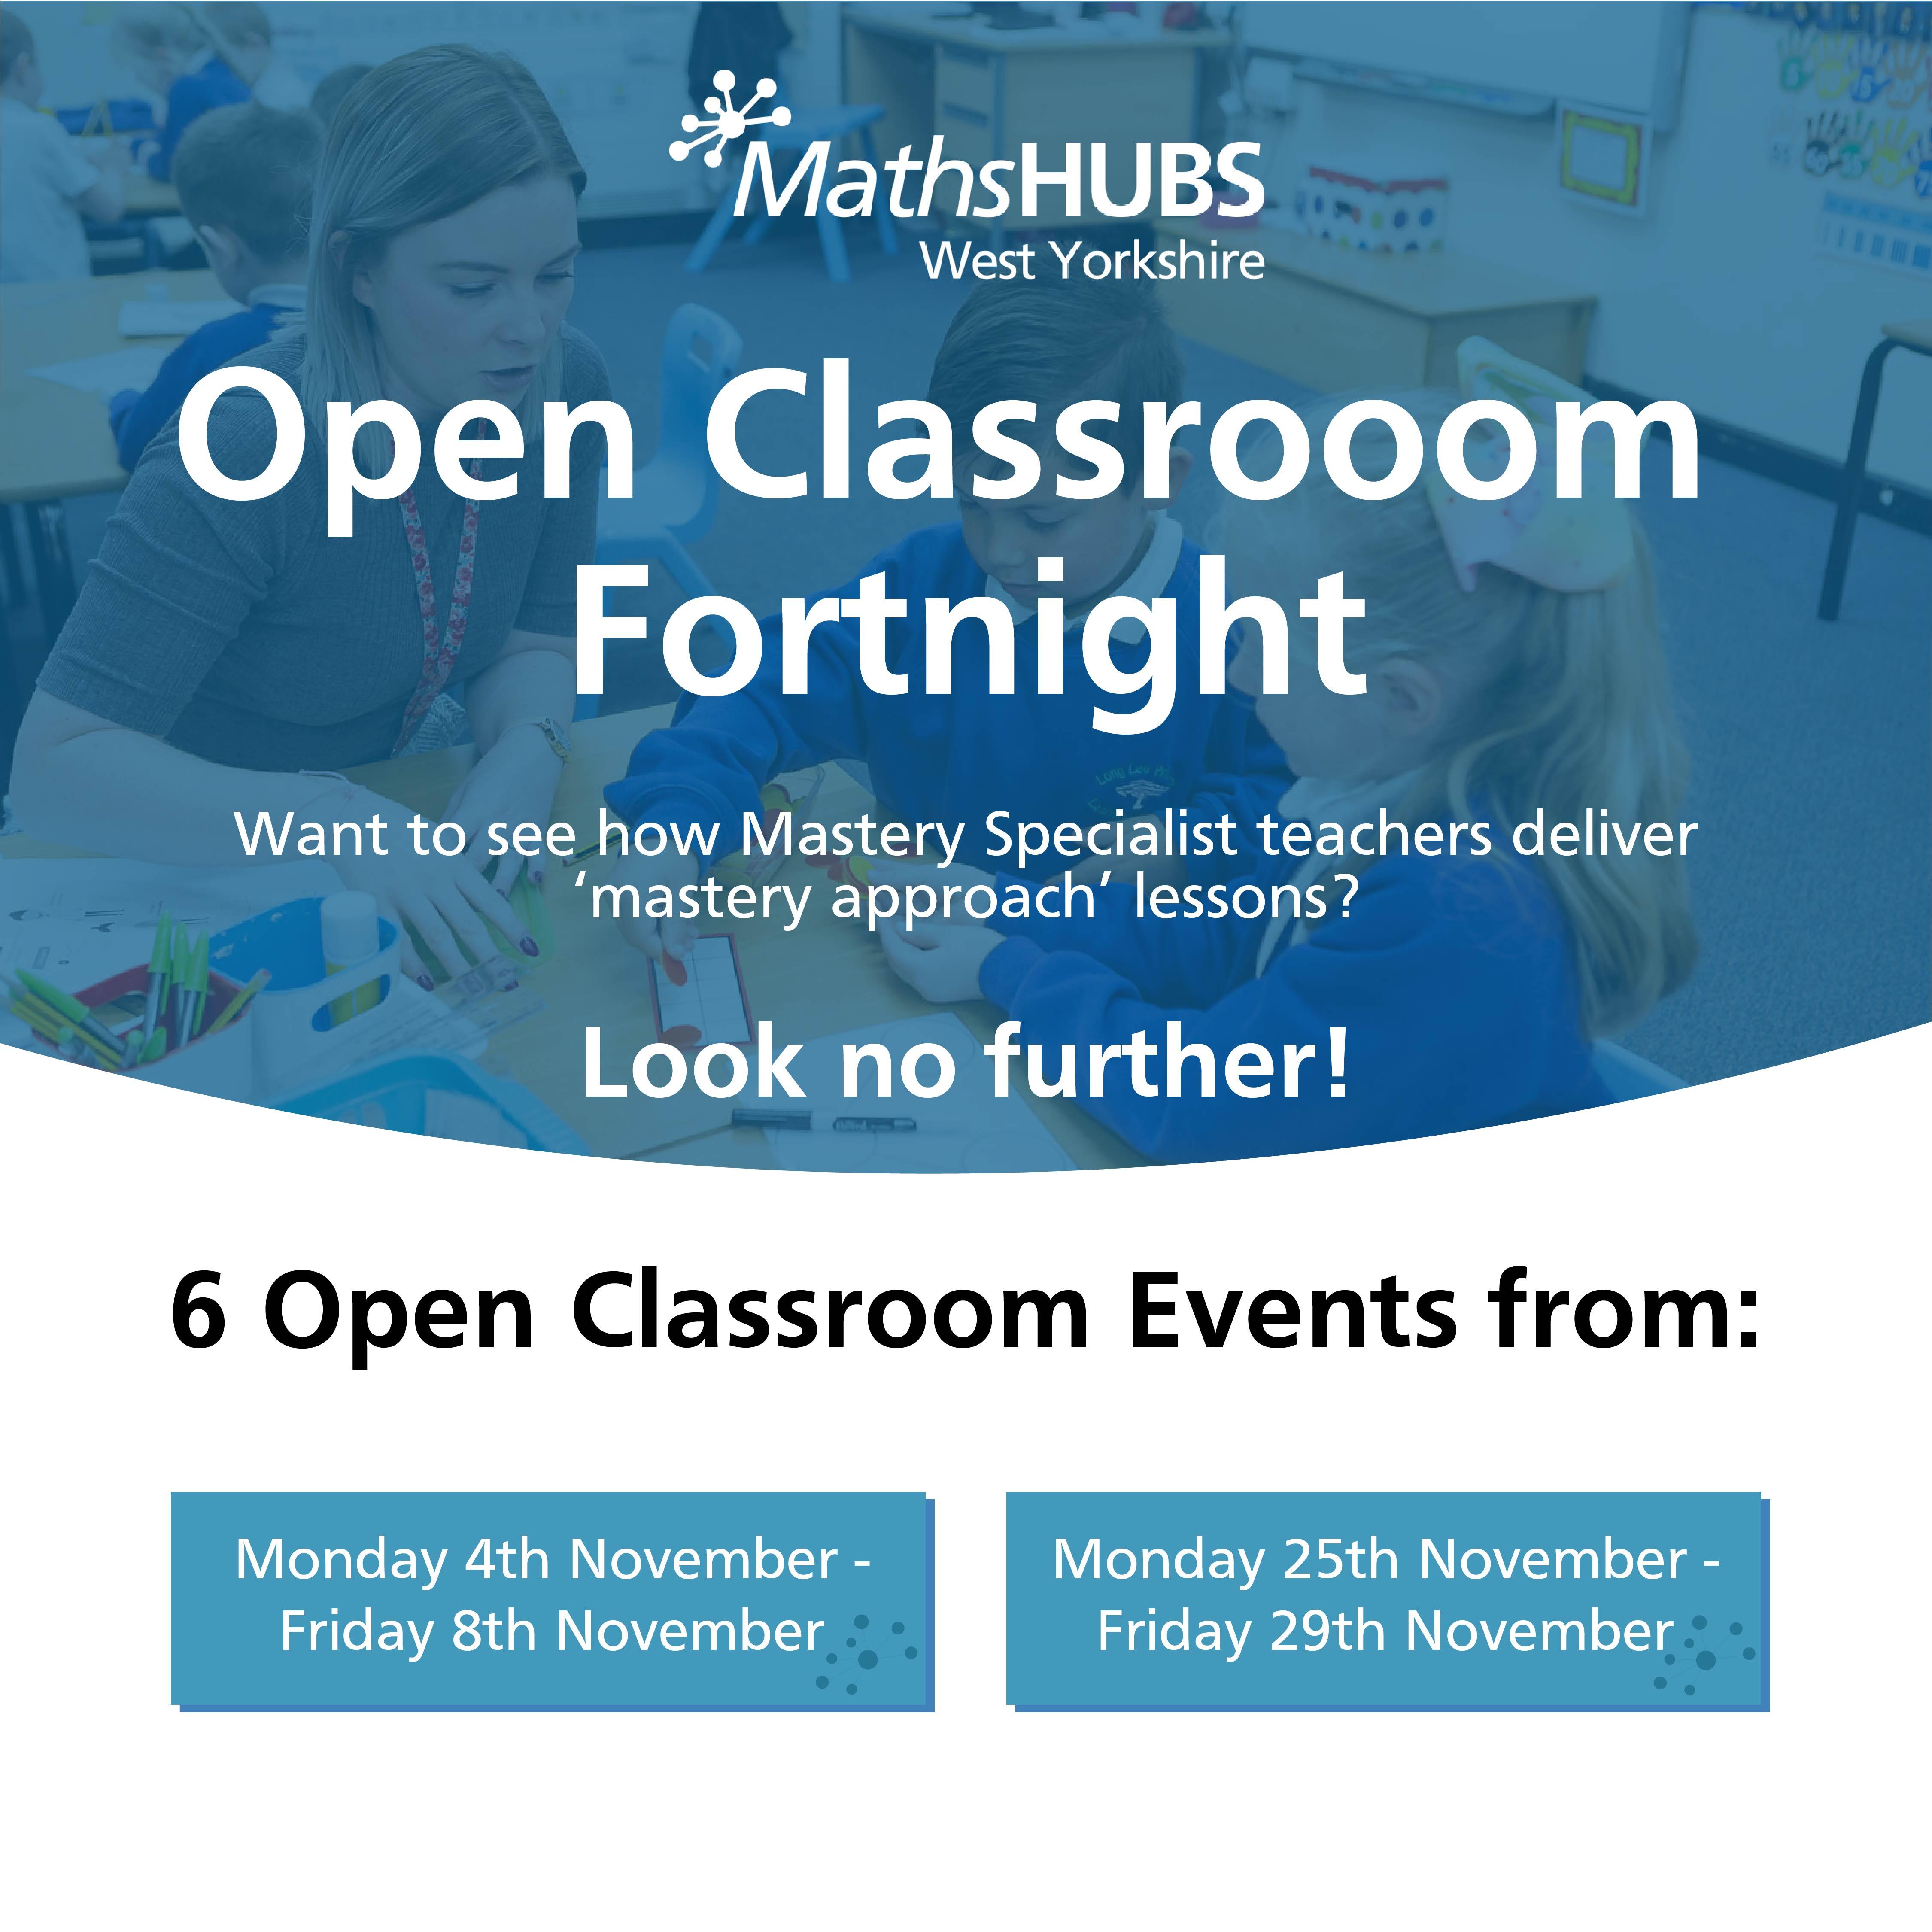 open classroom fortnight